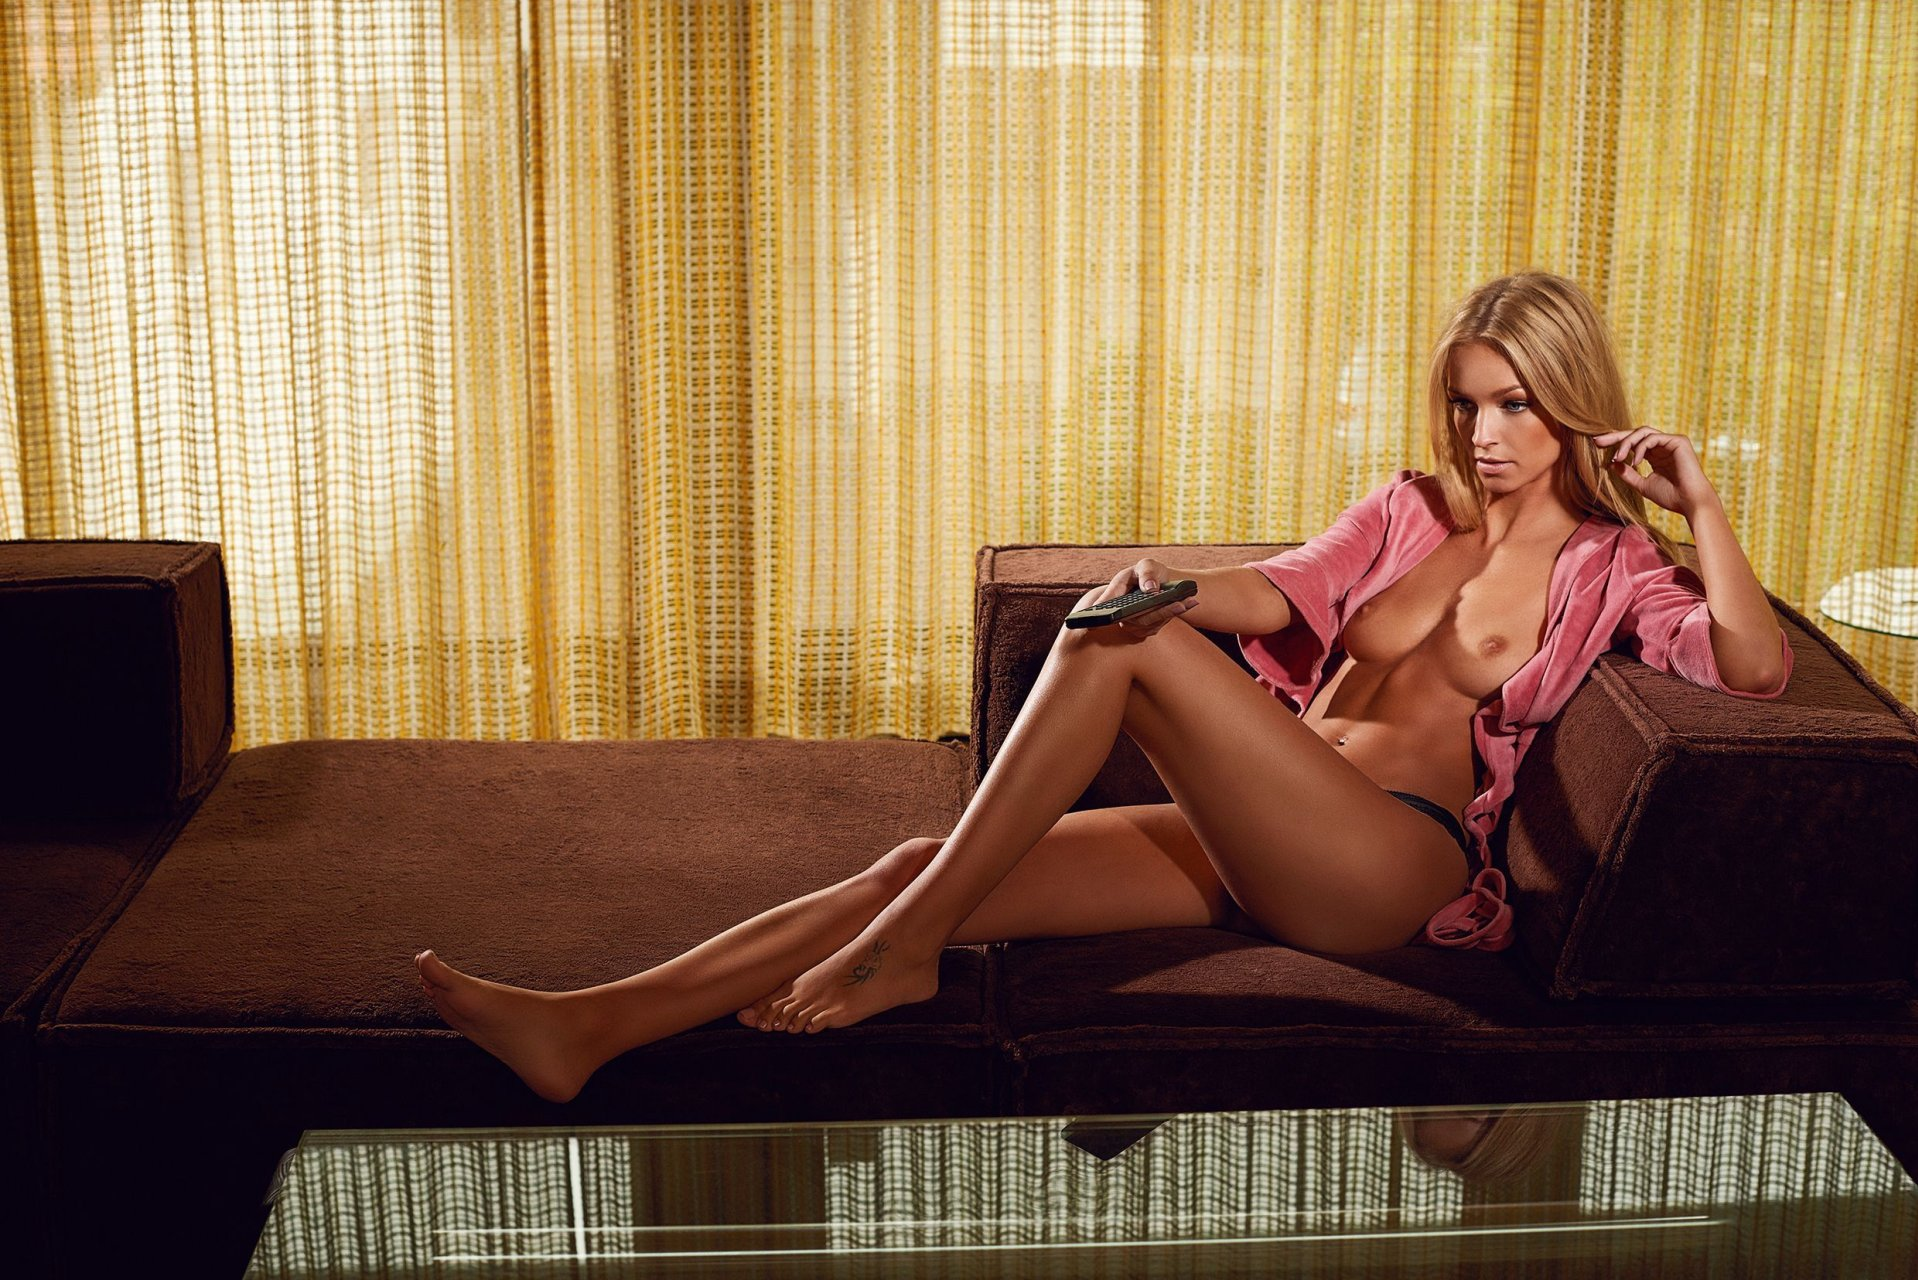 Naked bernadette kaspar Bernadette Pics